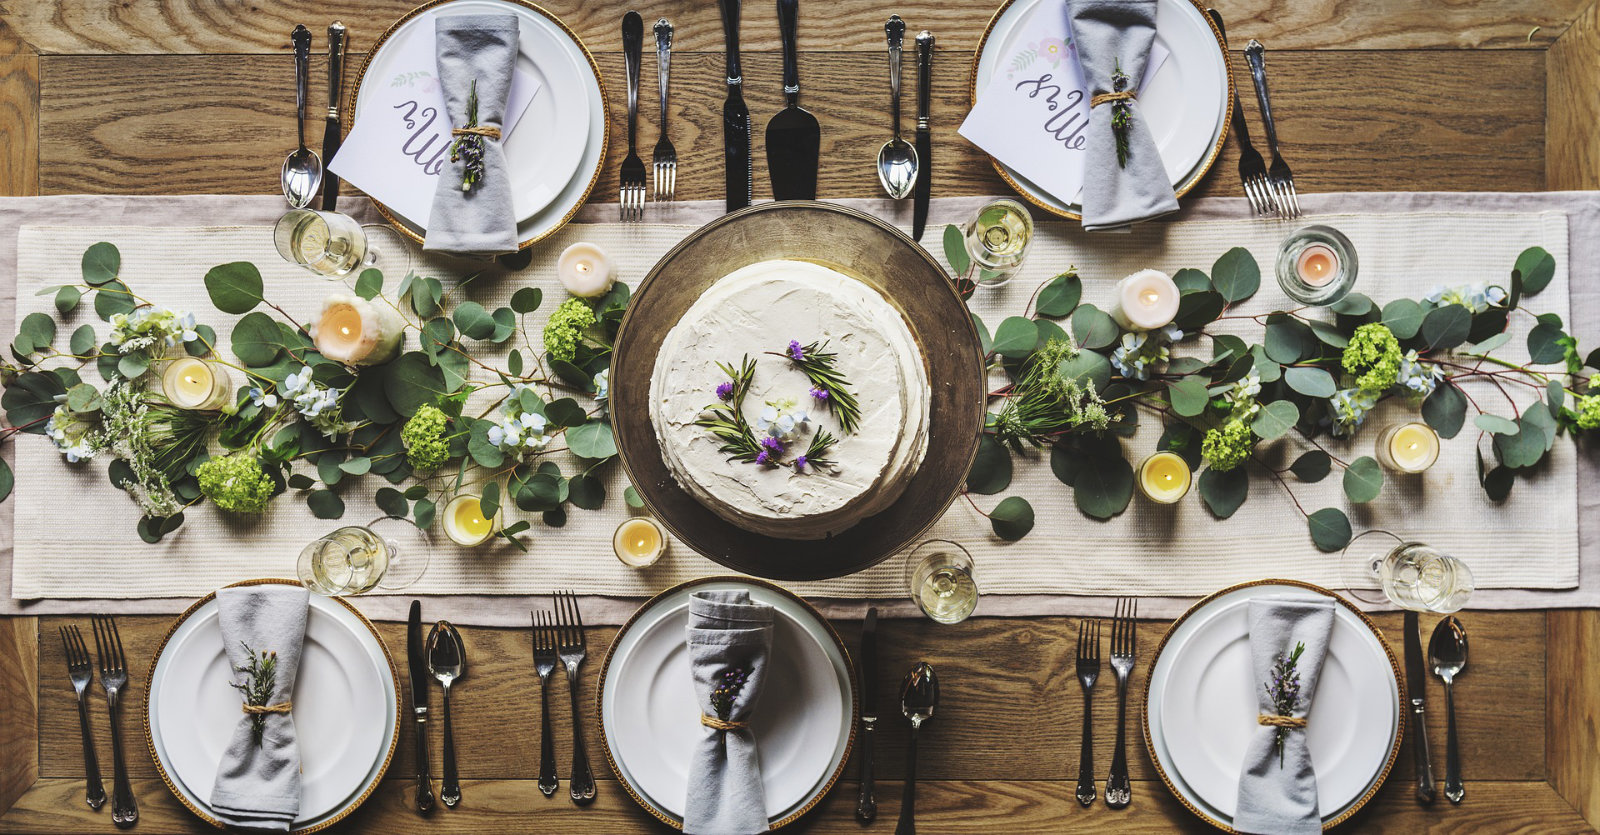 rosemary-wedding-cake-table.jpg